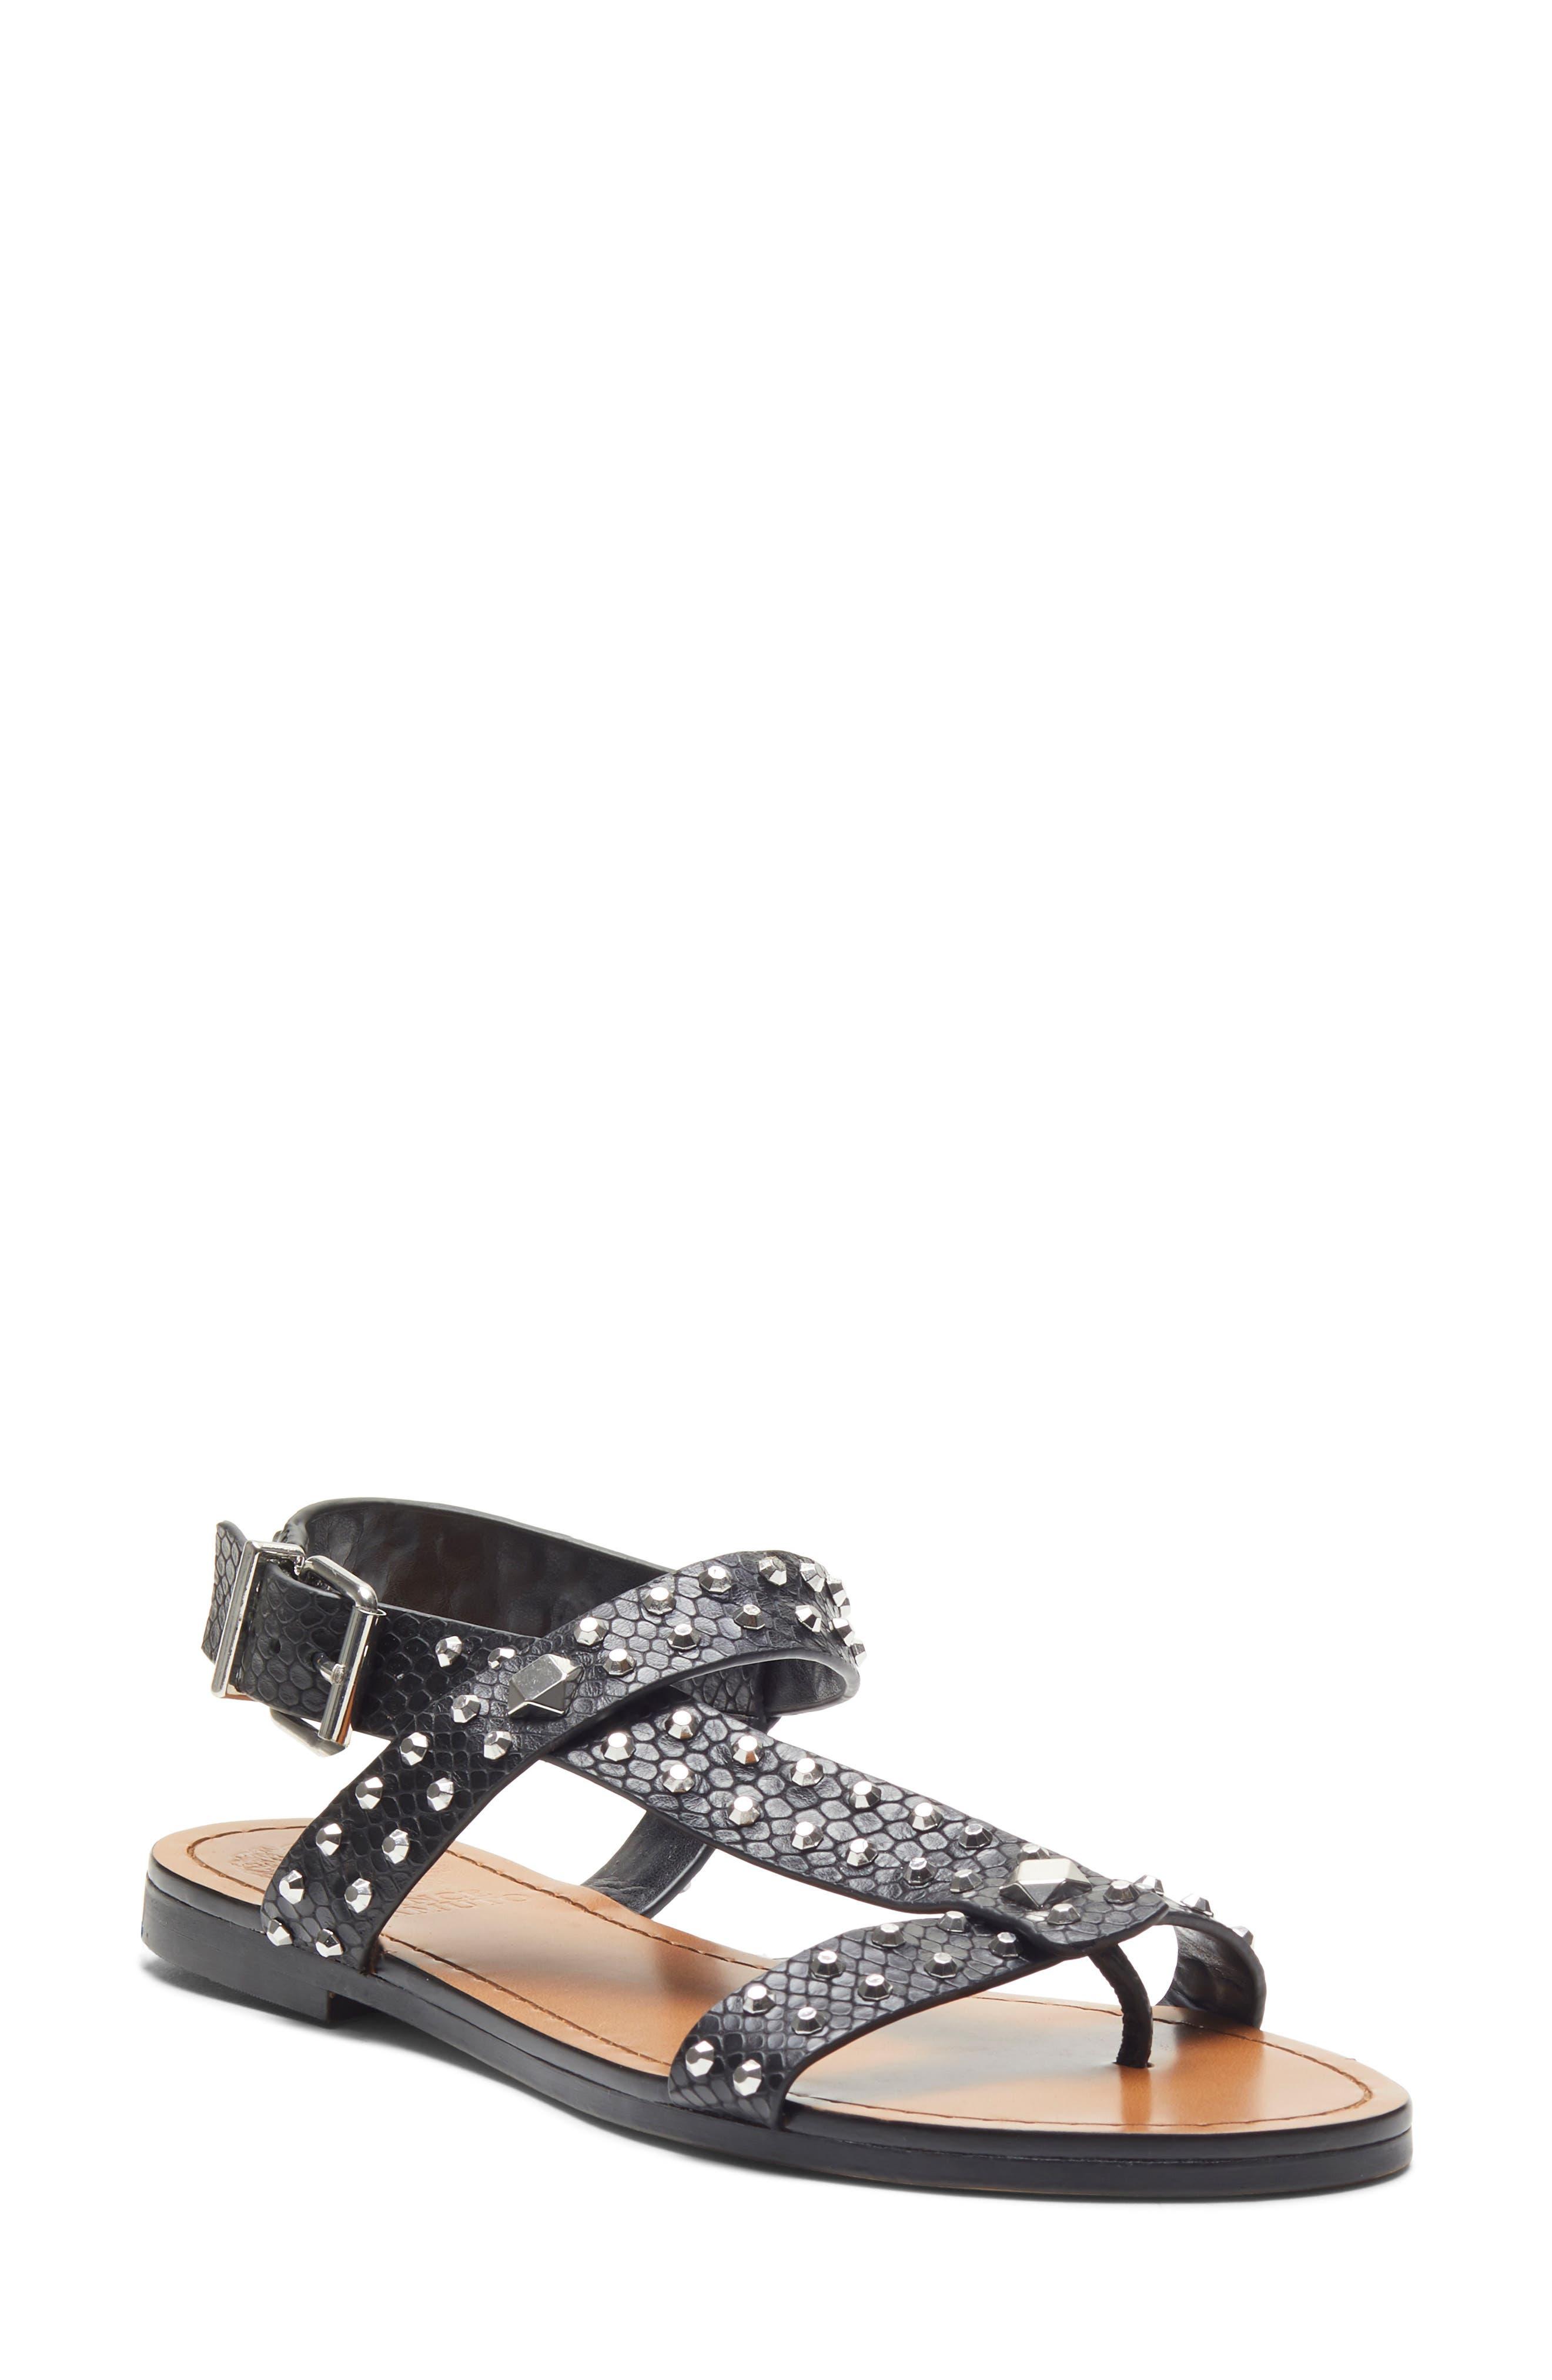 Ravensa Studded Sandal, Main, color, BLACK LEATHER